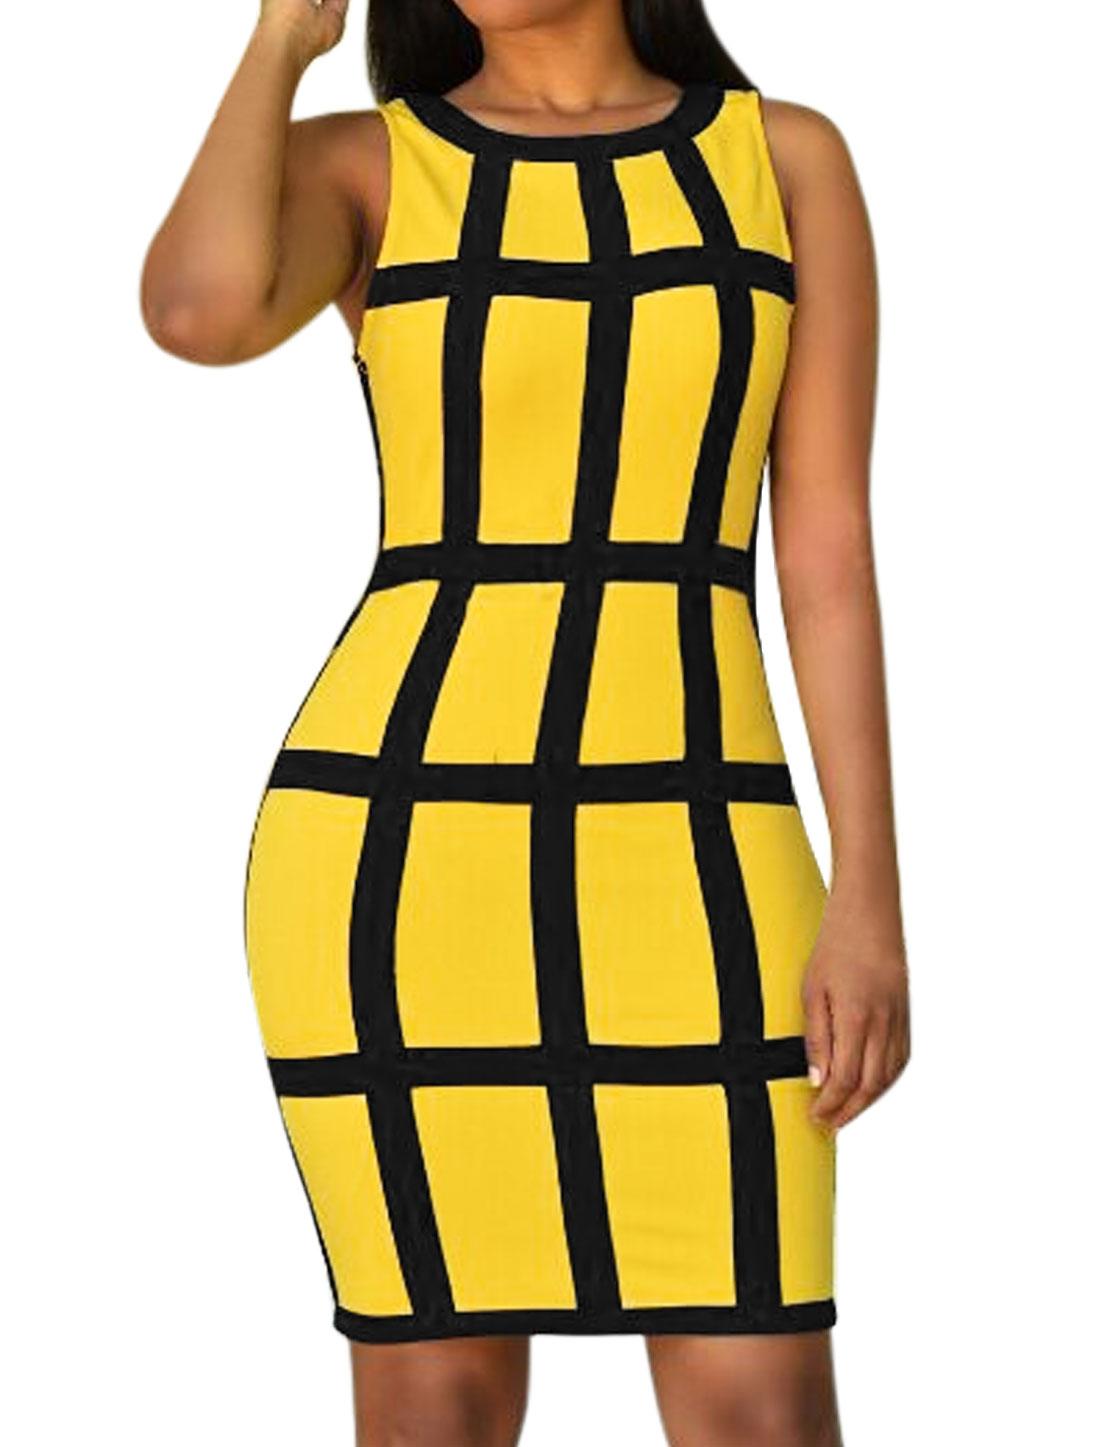 Women-Round-Neck-Contrast-Color-Checks-Slim-Fit-Tank-Dress